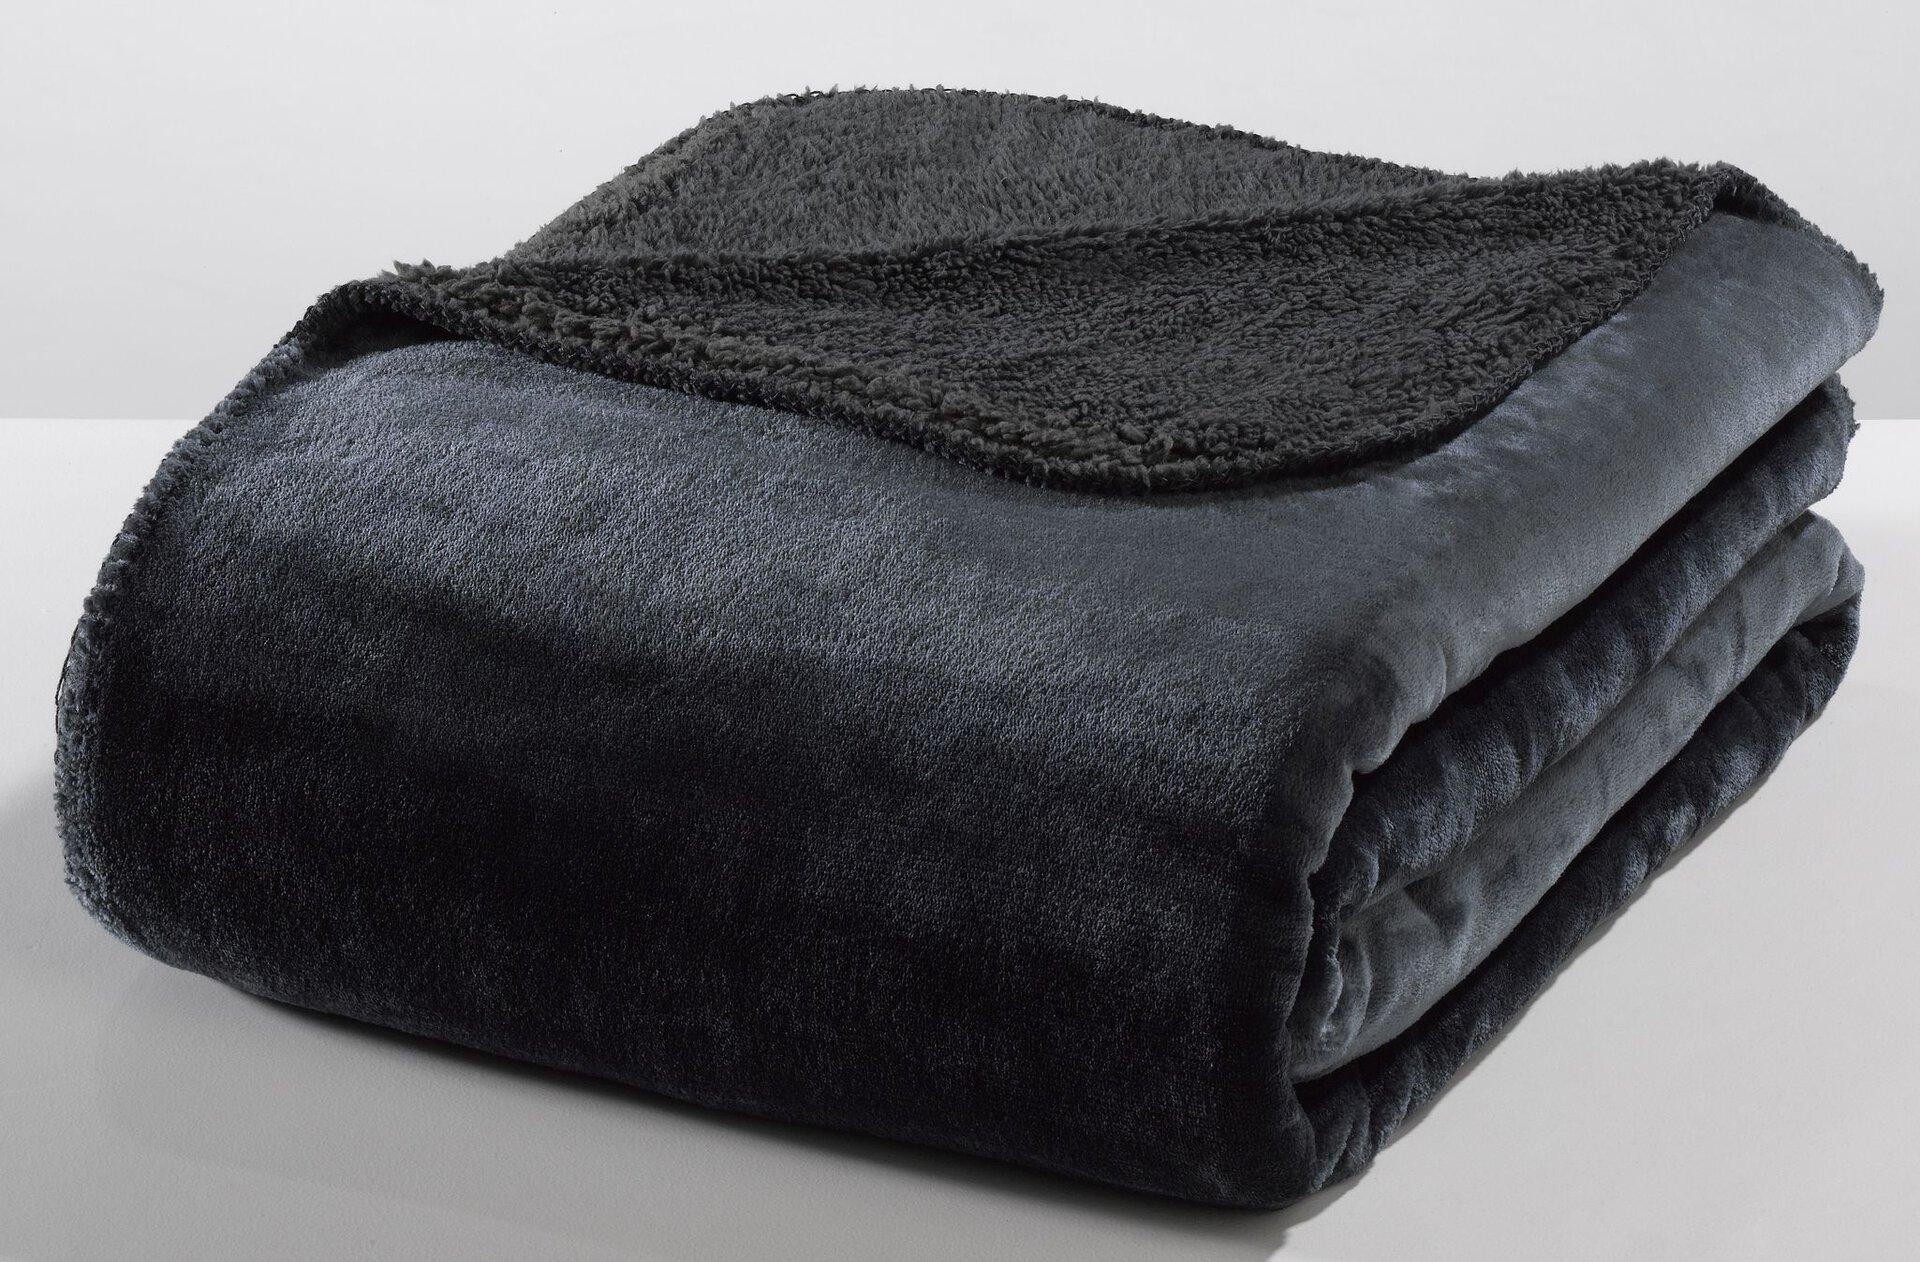 Flanelldecke 18209 CasaNova Hengya x-mas Casa Nova Textil grau